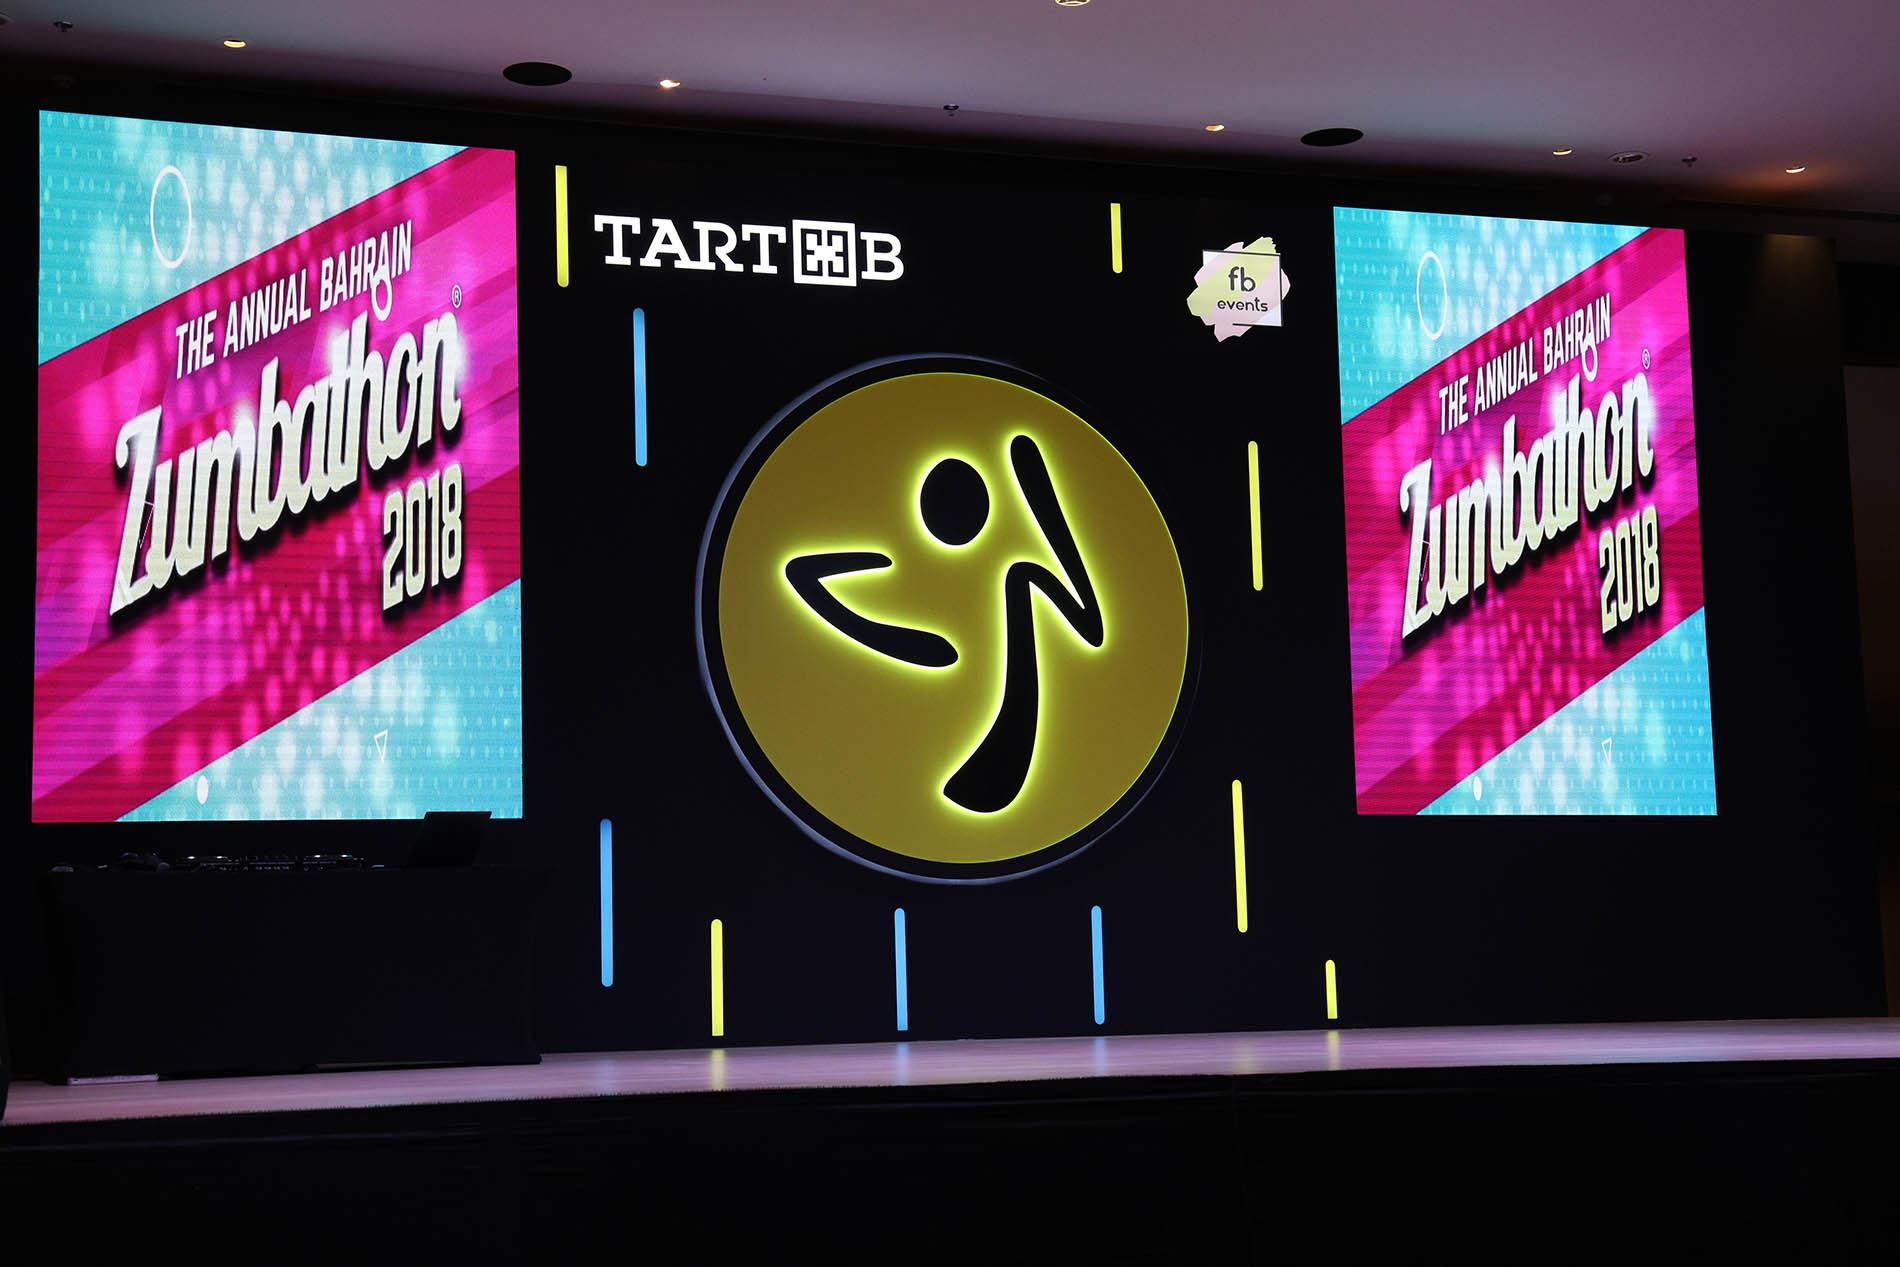 Annual Zumbathon 2018 FB Events & Tarteeb